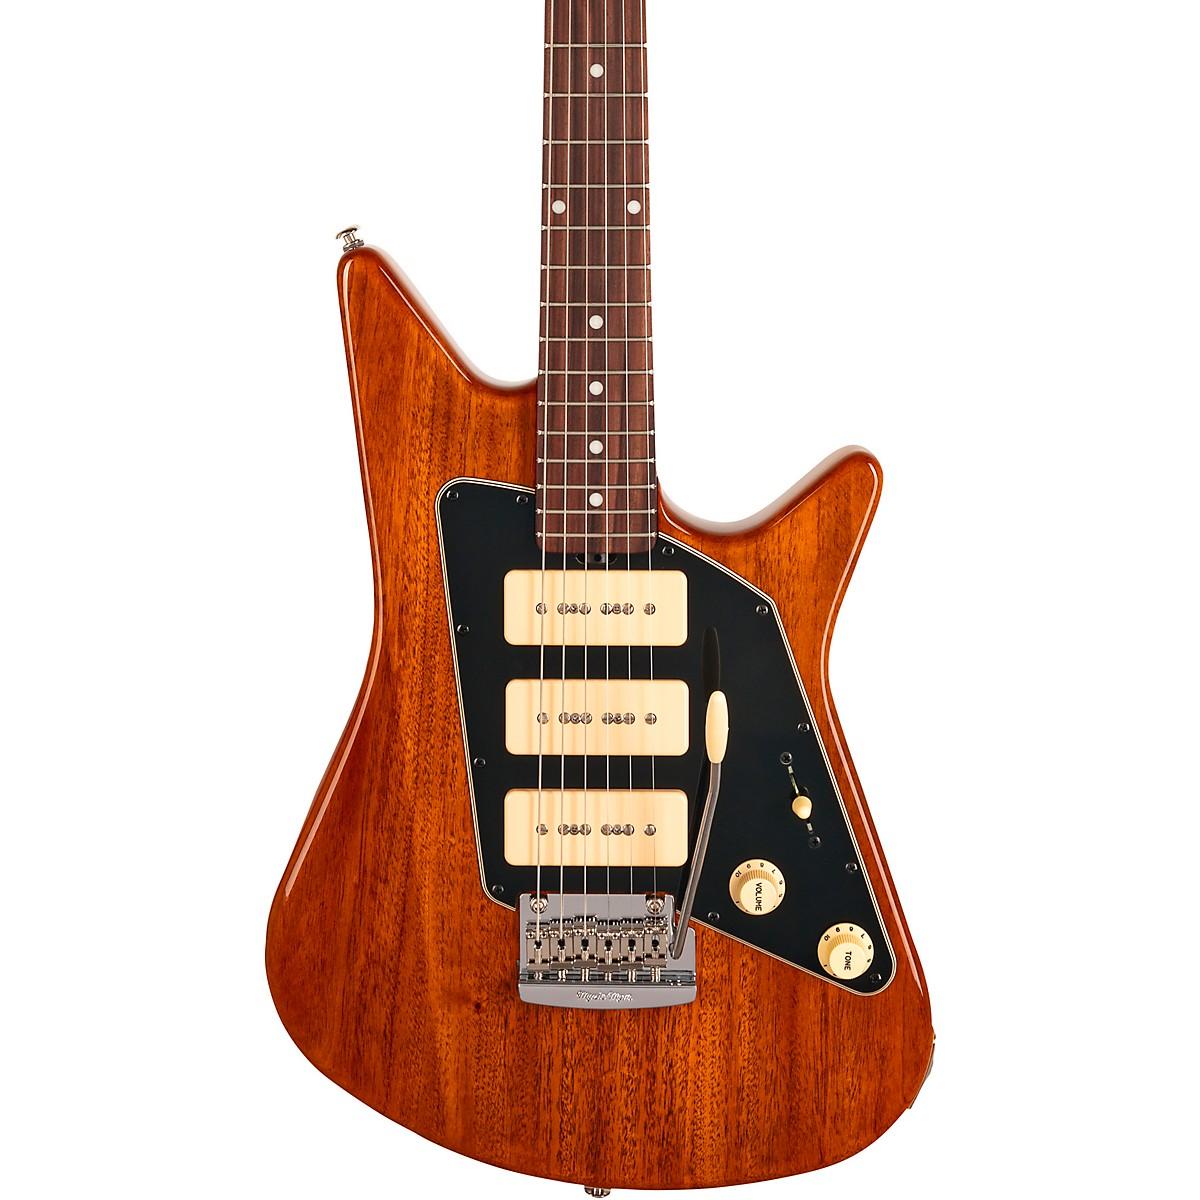 Ernie Ball Music Man Albert Lee MM90 BFR Electric Guitar